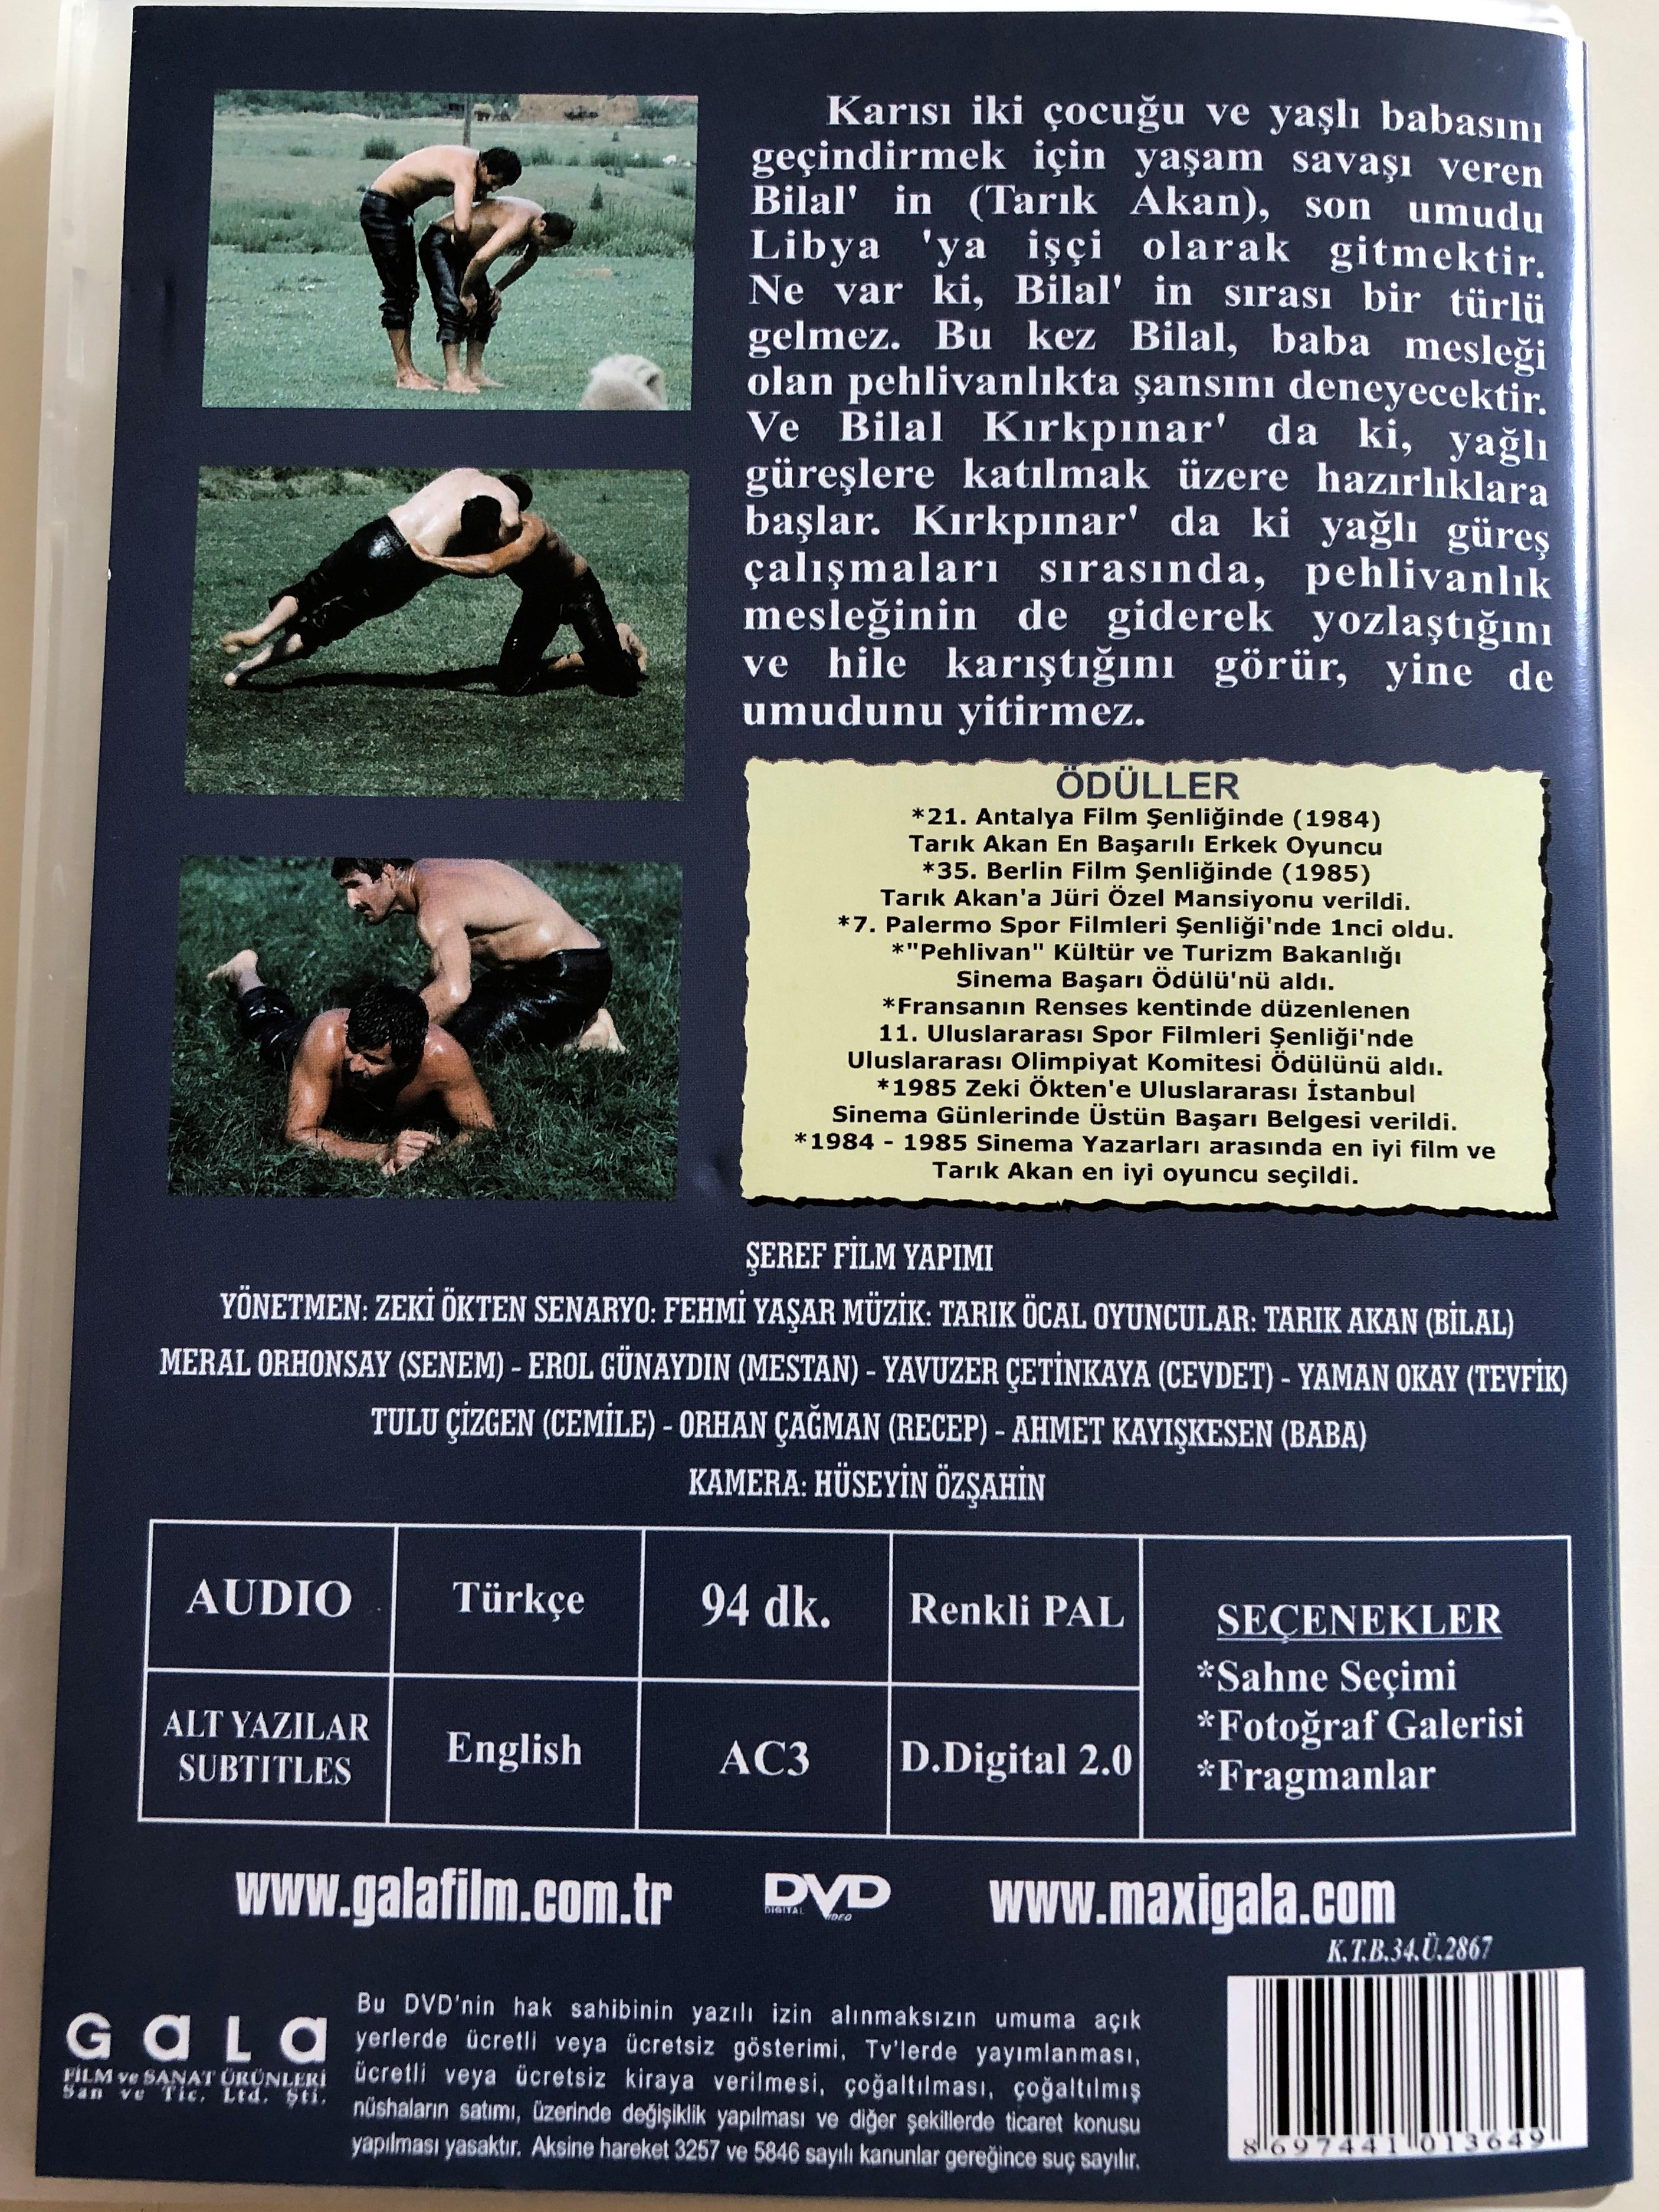 pehlivan-dvd-1984-directed-by-zeki-kten-starring-tar-k-akan-meral-orhonsay-erol-g-naydin-yavuzer-cetinkaya-2-.jpg